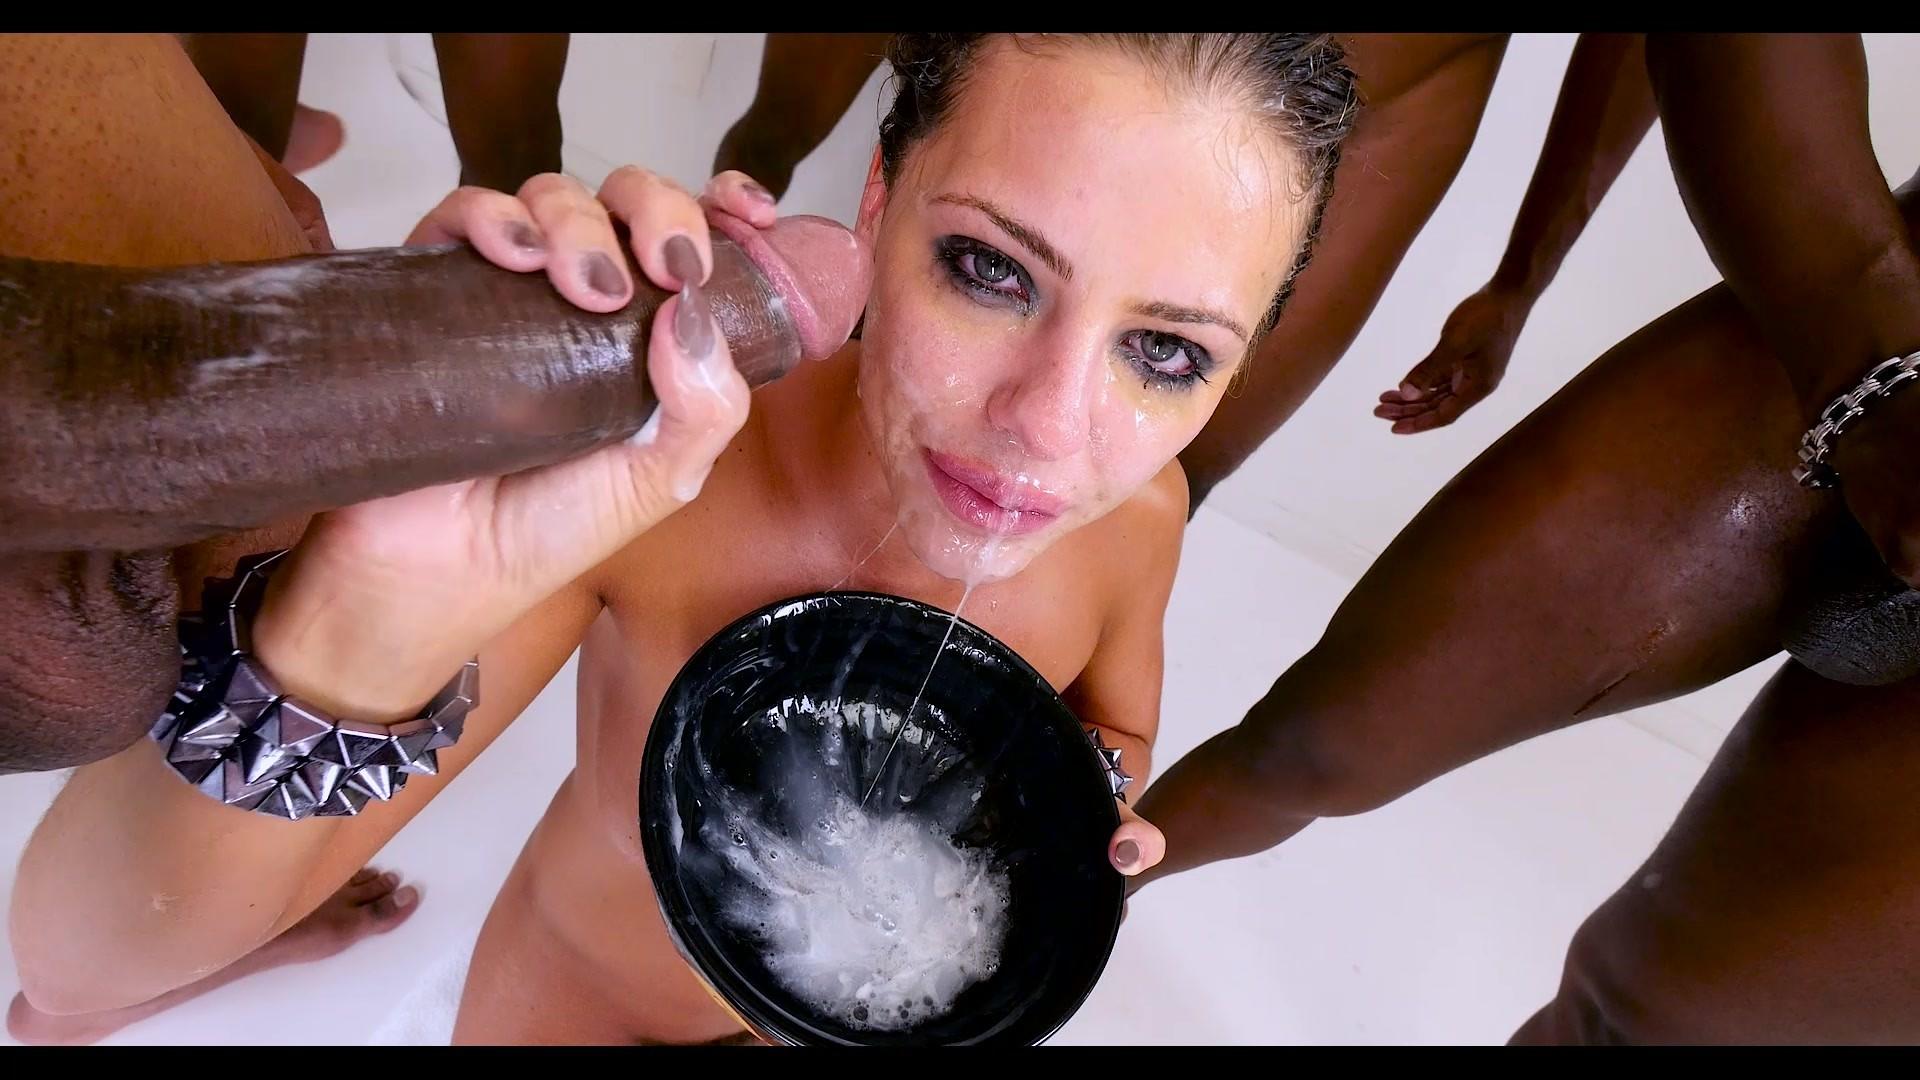 Adriana Chechik The Ultimate Slut adriana chechik the ultimate slut streaming video on demand